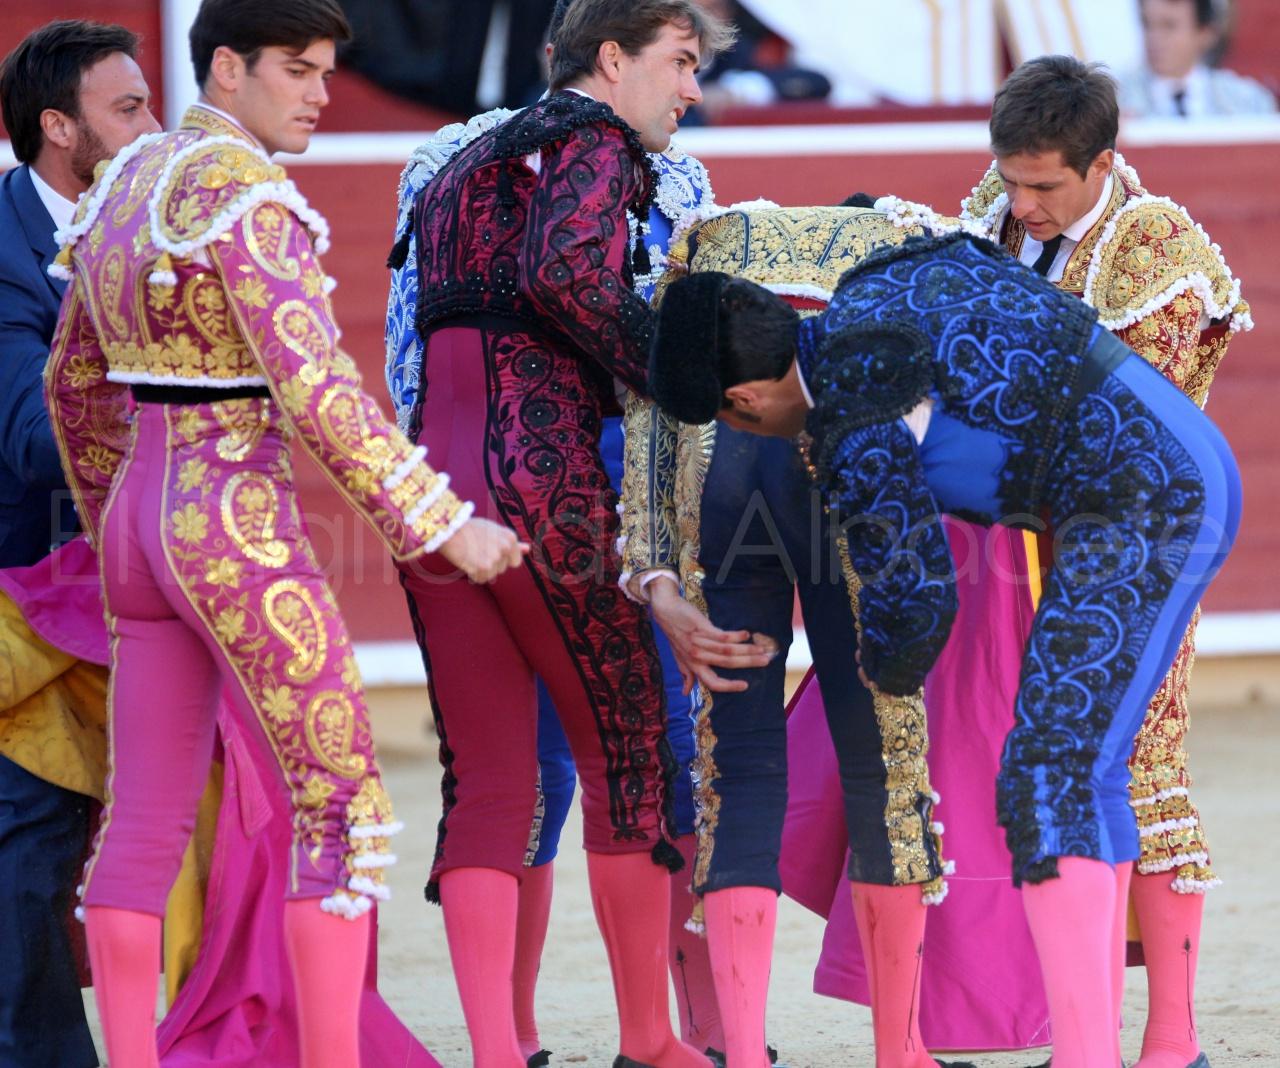 El Juli Lopez Simon y Garrido Feria Albacete 2015 toros  44